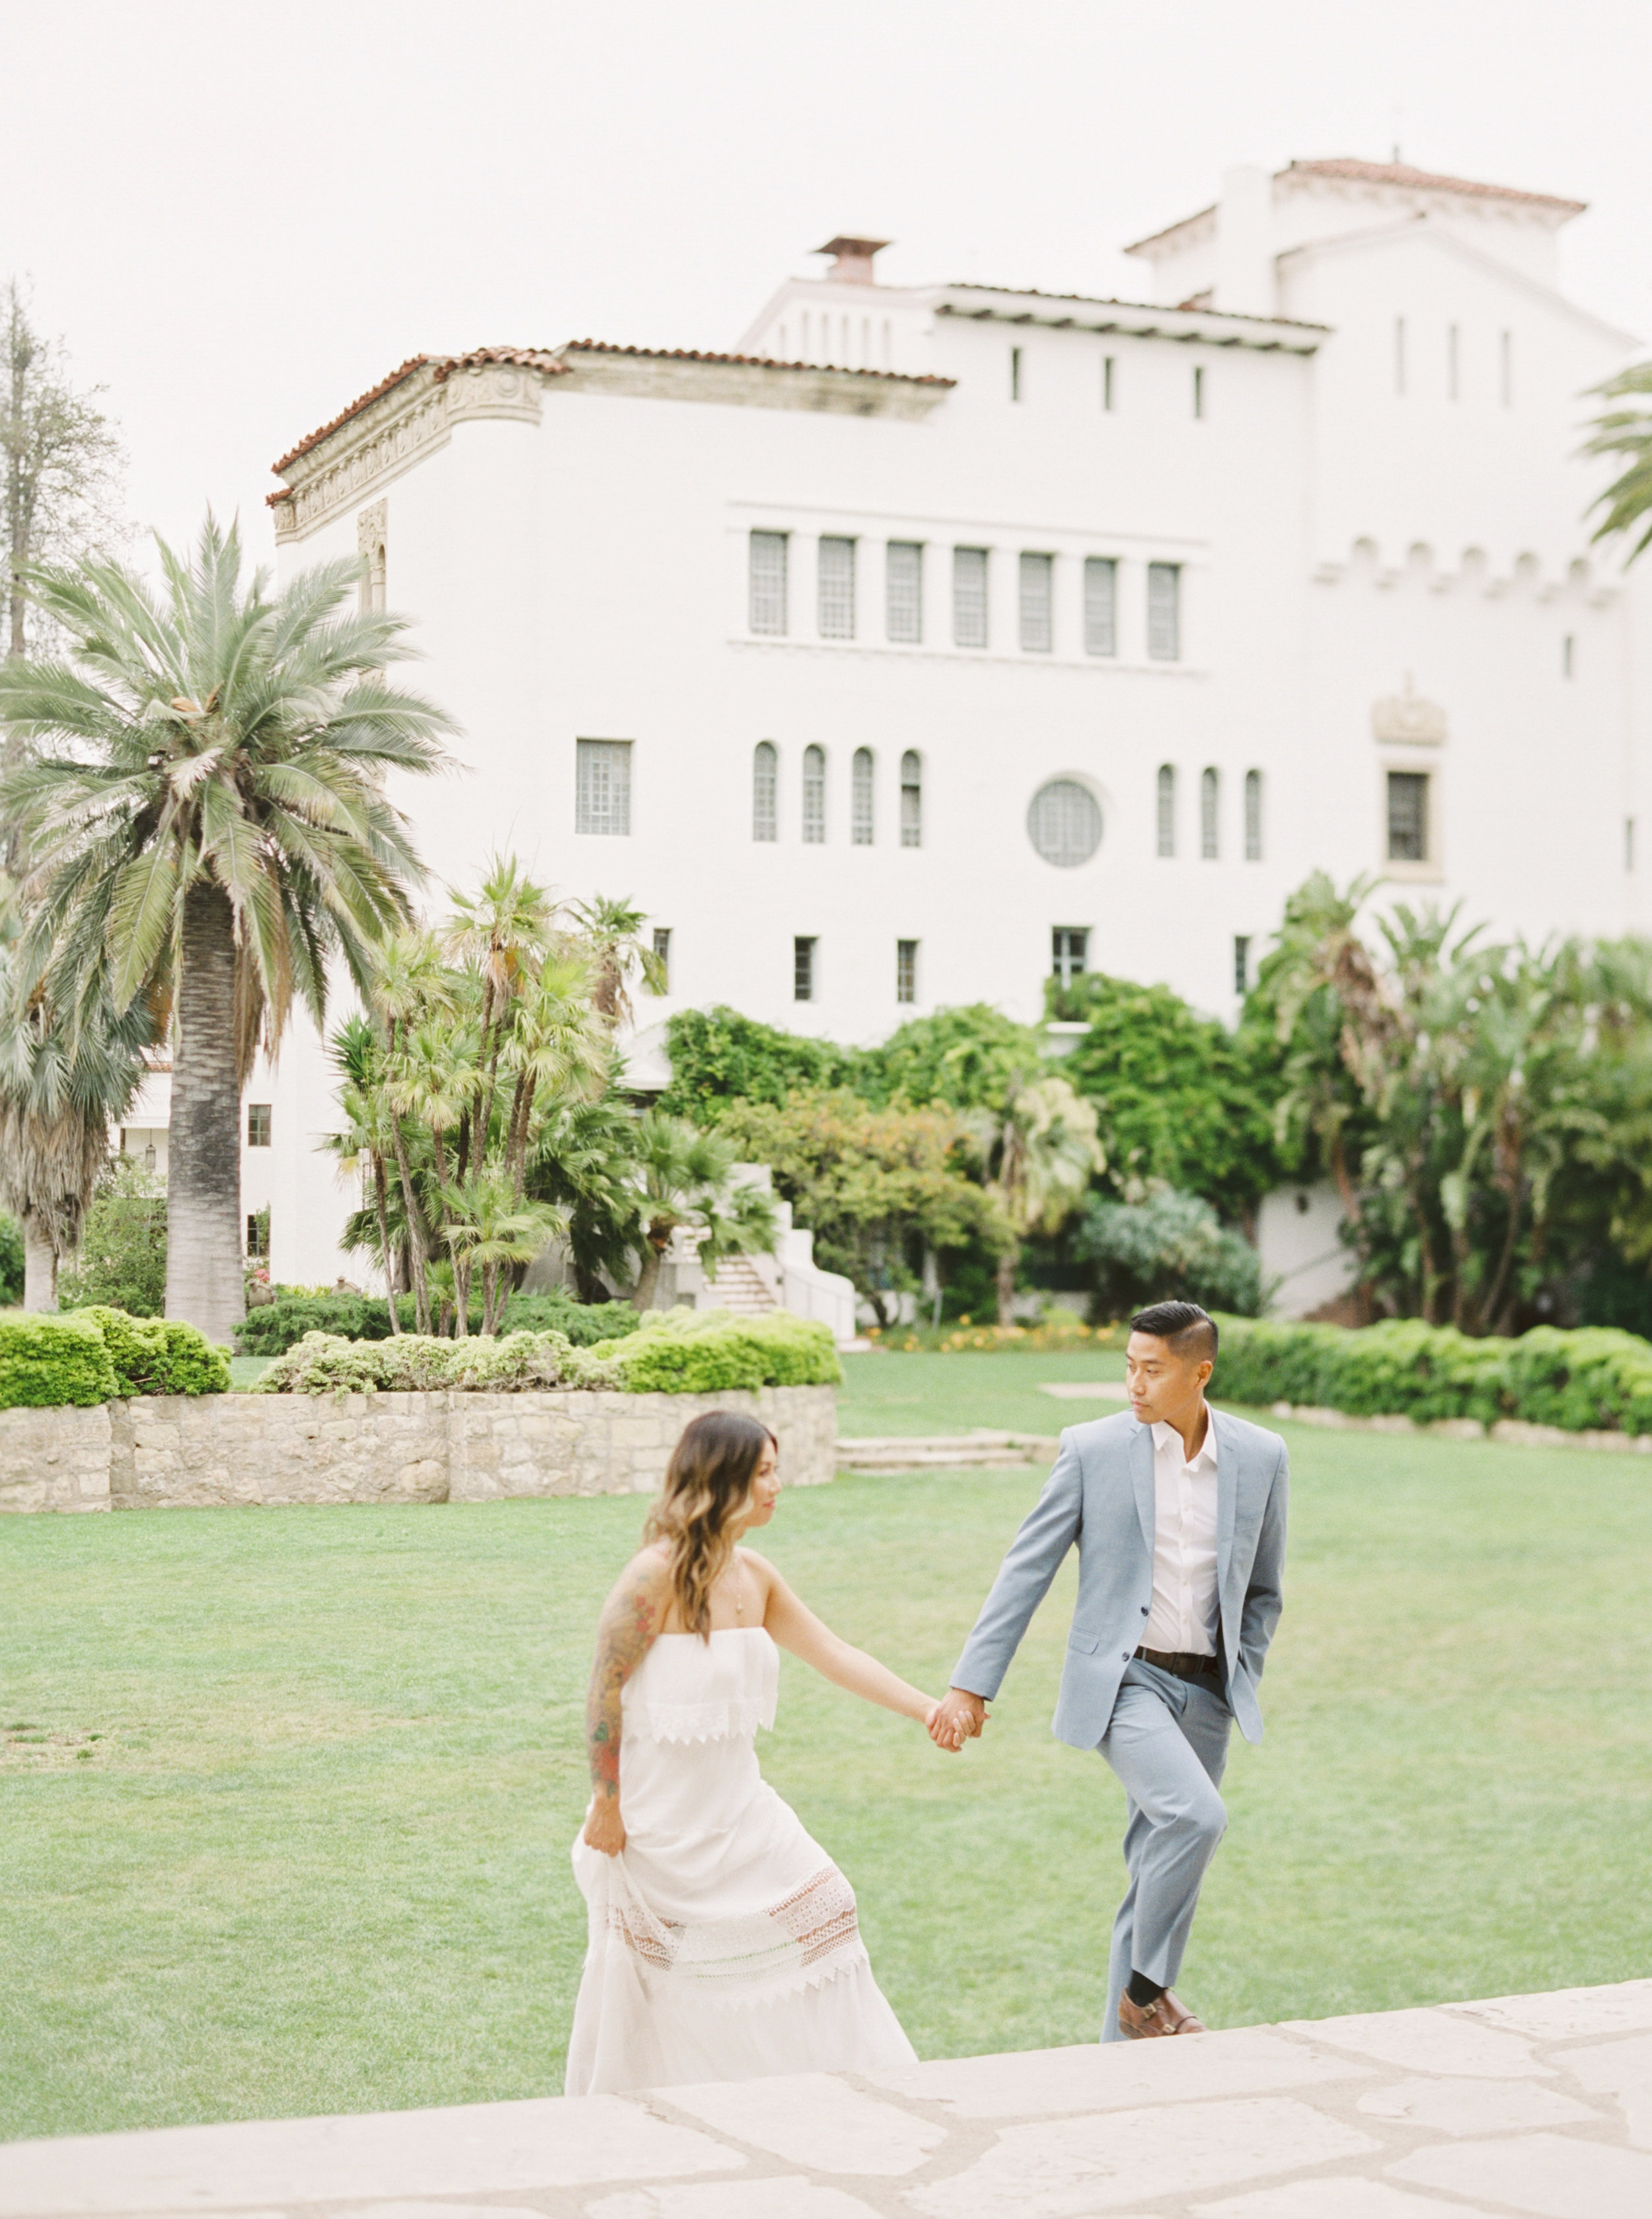 Santa Barbara California Fine Art Film Wedding Photographer Sheri McMahon - Spanish influence architecture - Downtown Santa Barbara - Santa Barbara Courthouse